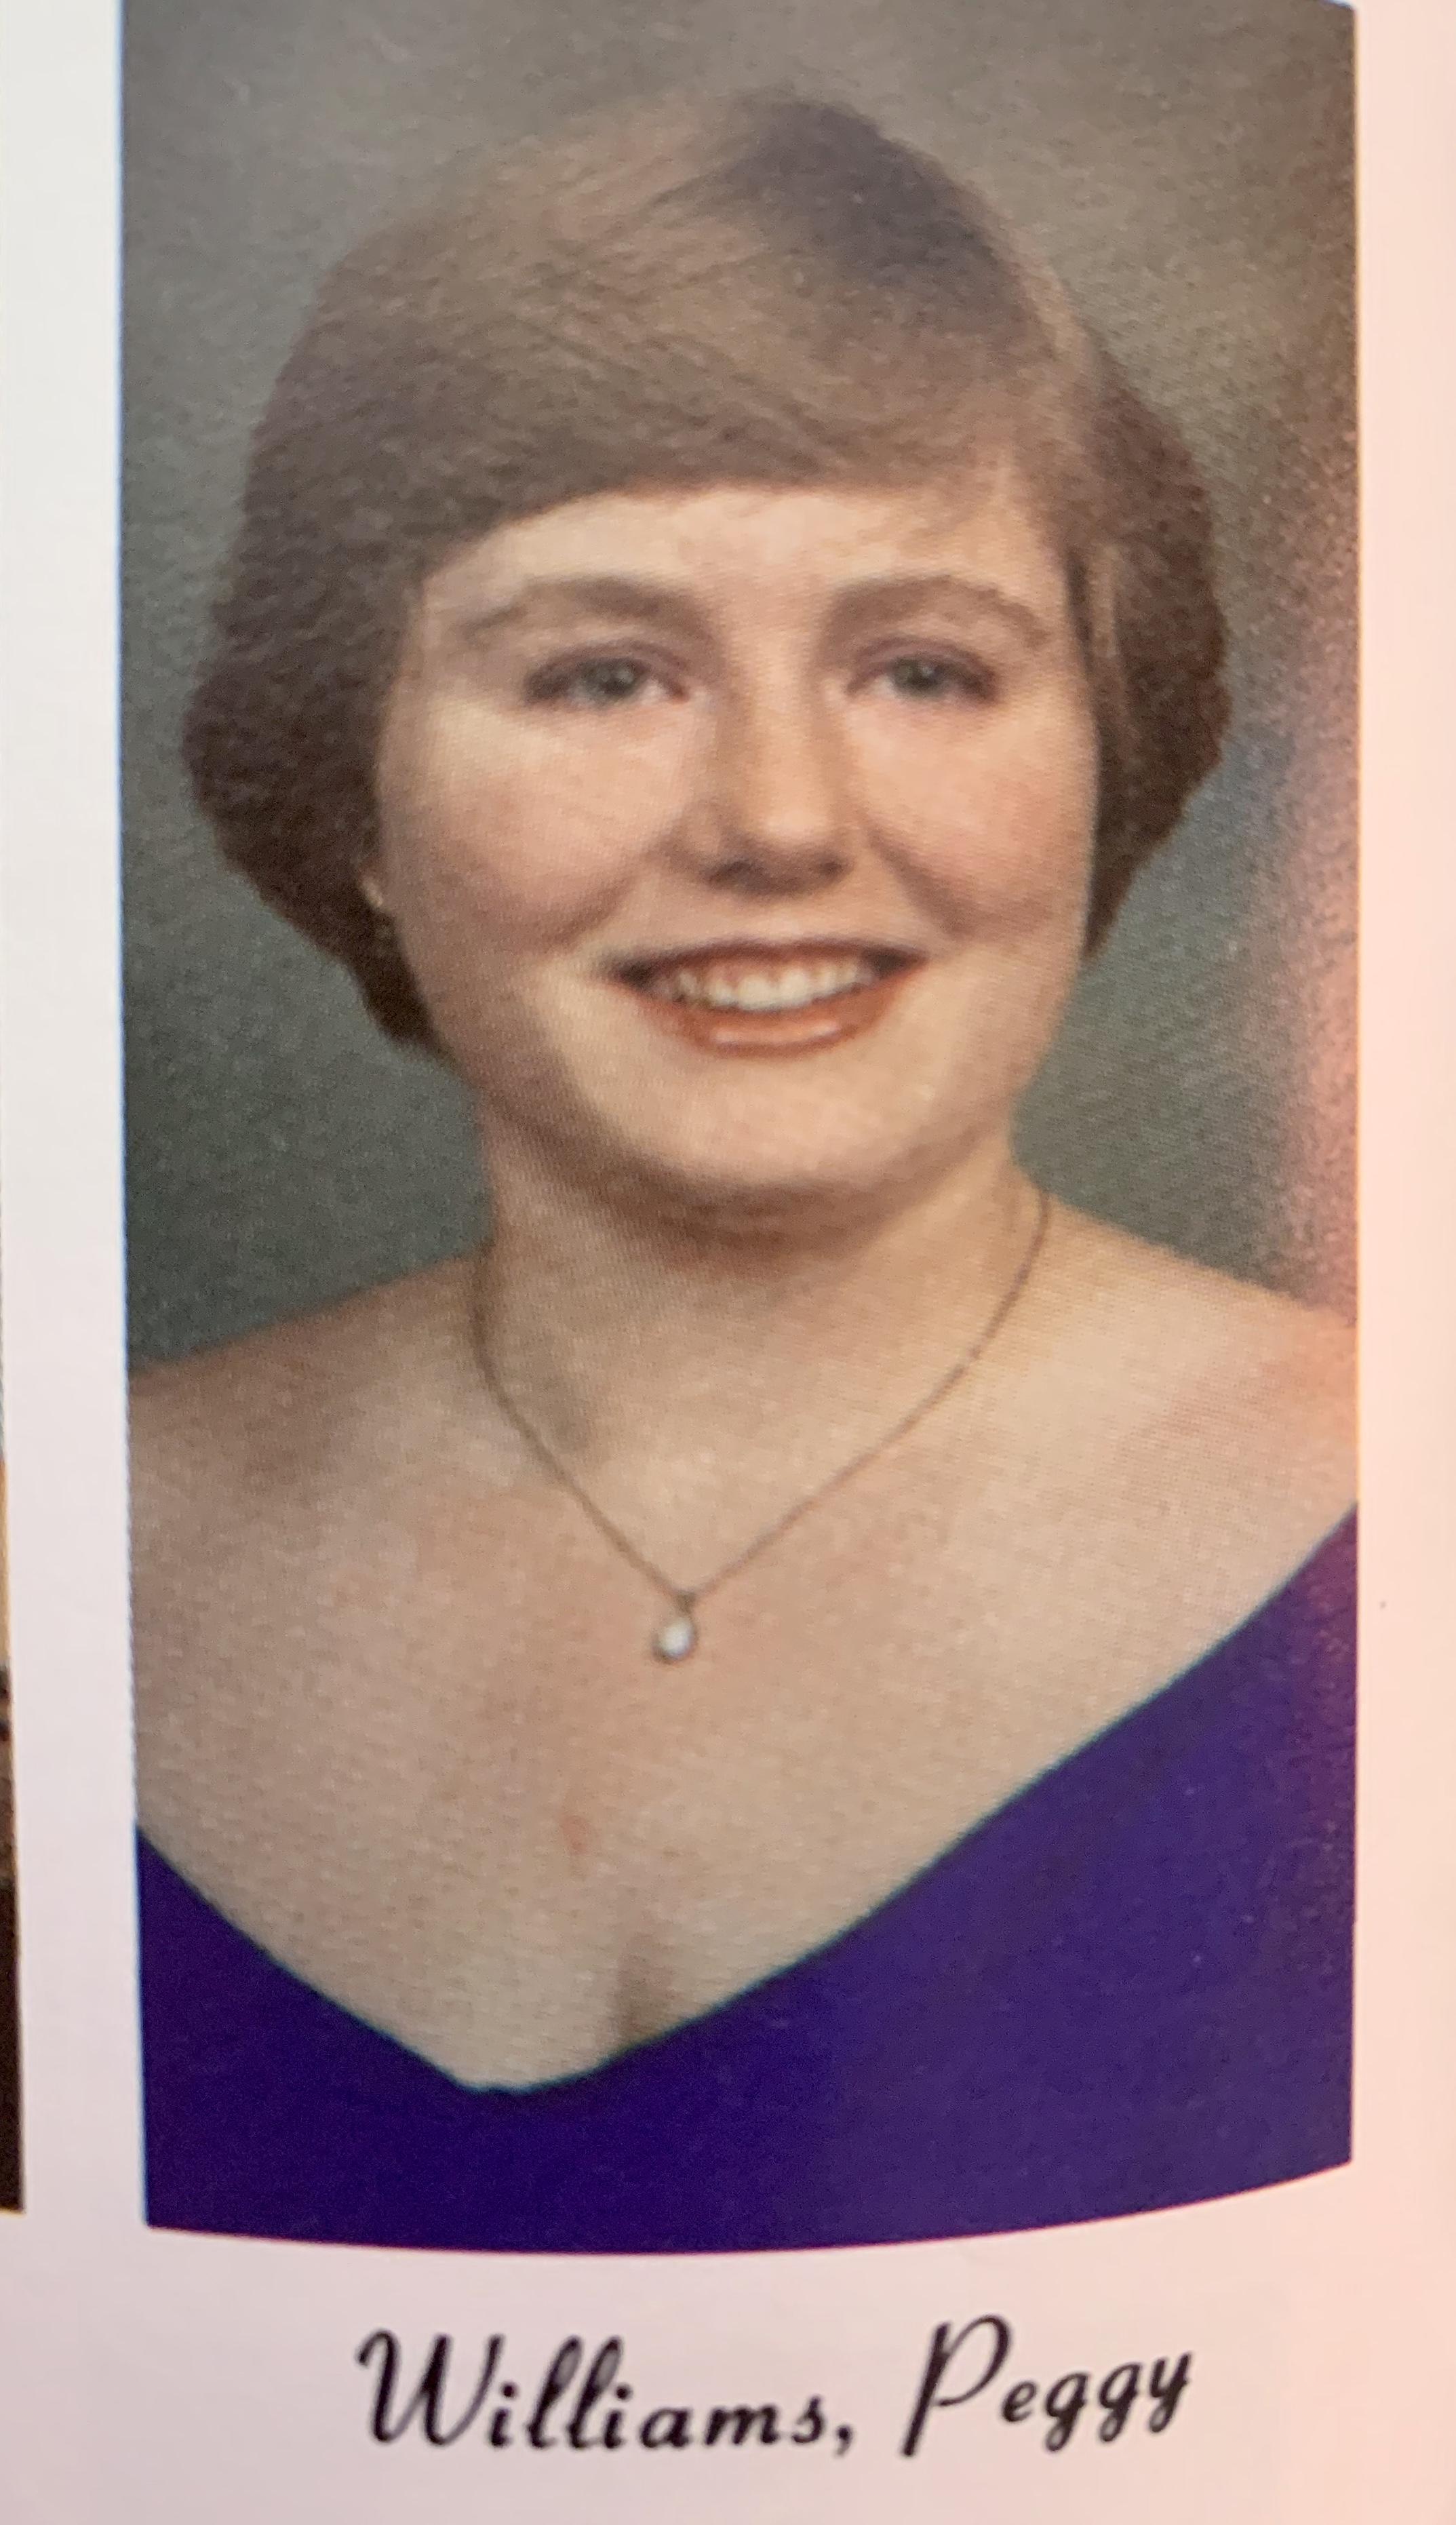 My love Peggy 1983